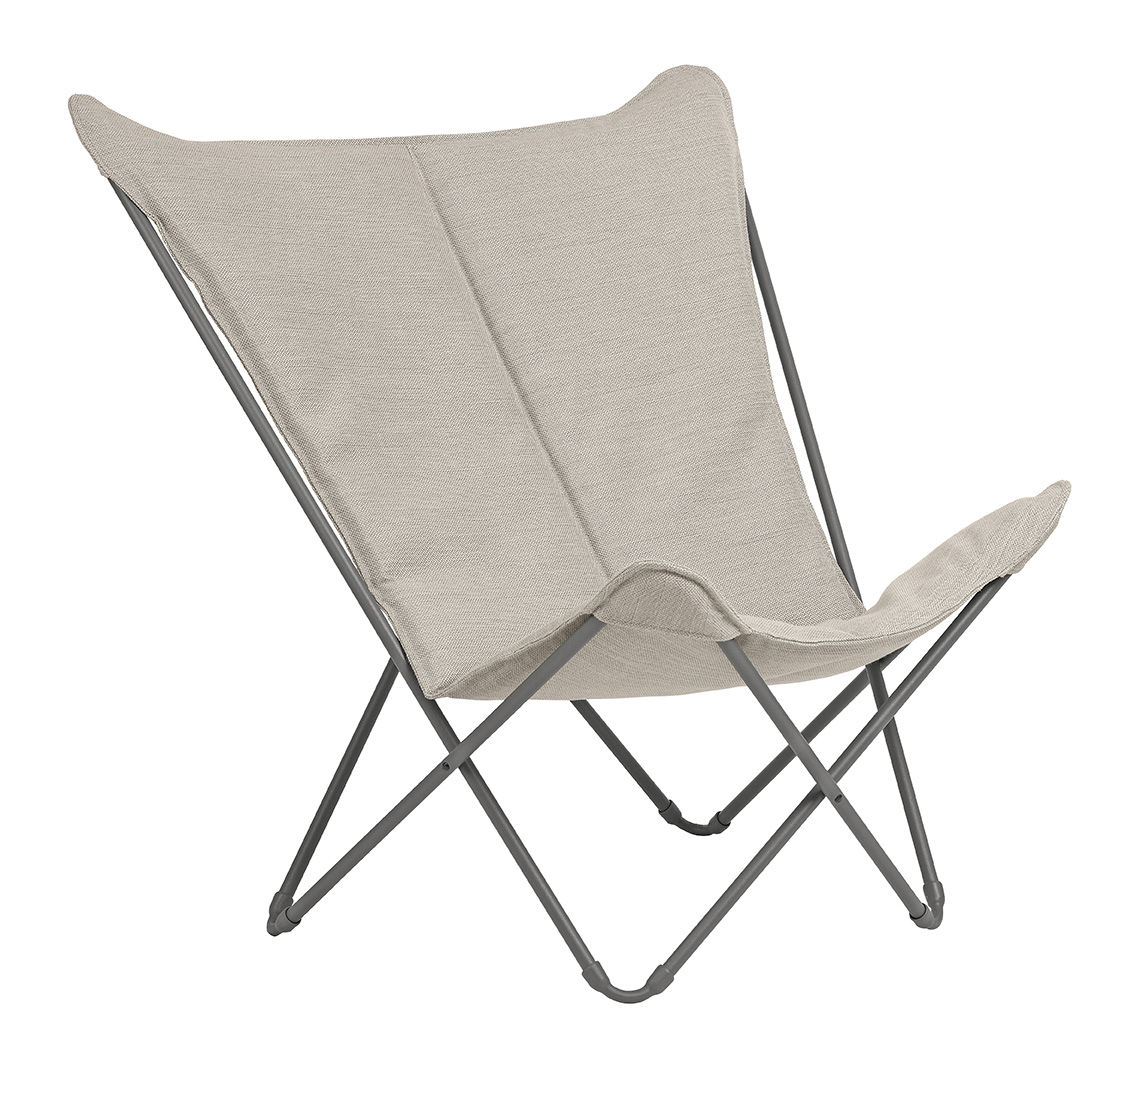 Lounge Chair - Titane Steel Frame - Latte Hedona Fabric